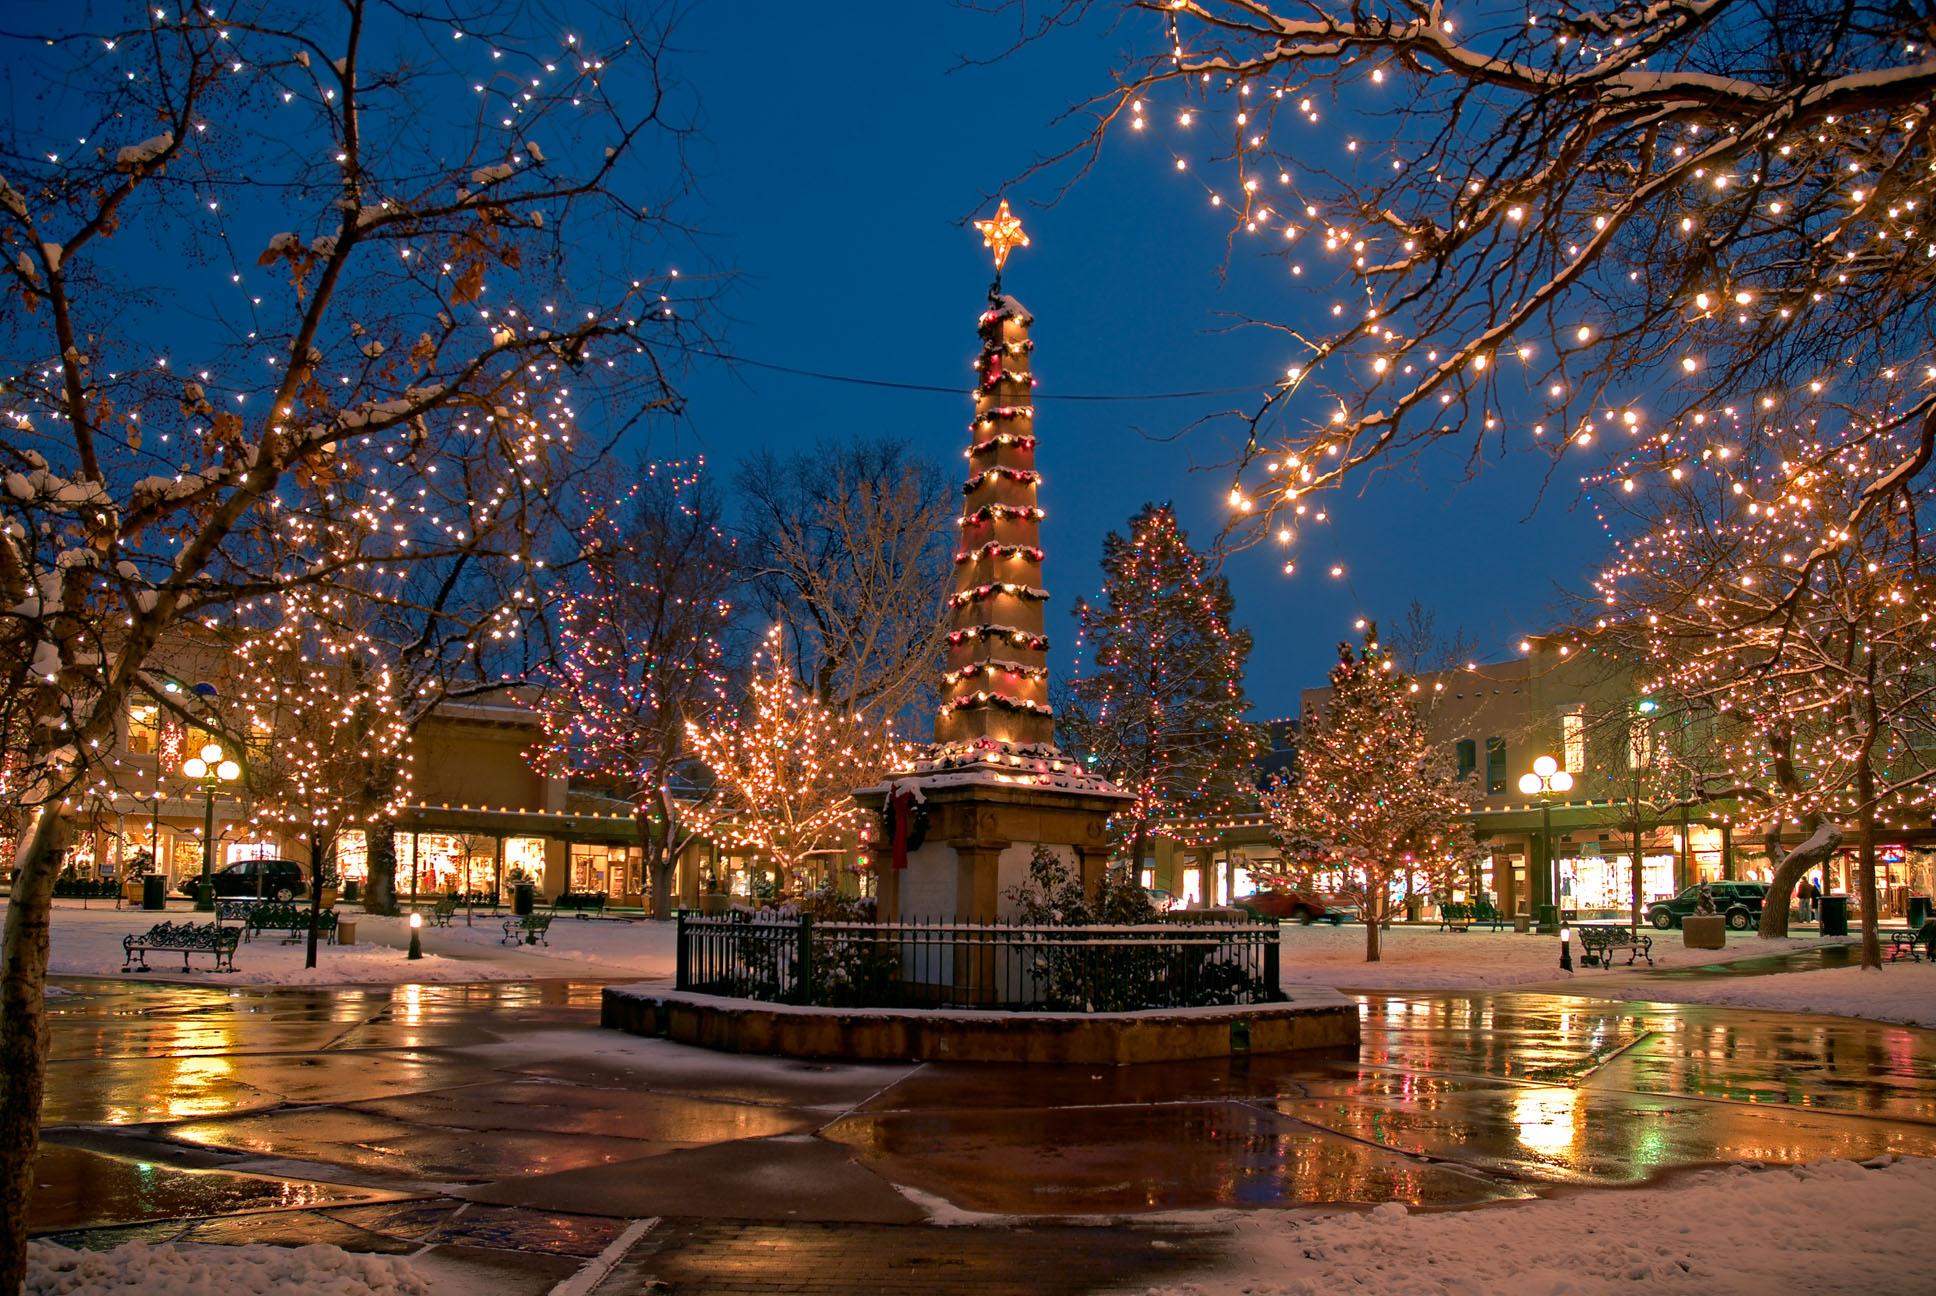 Santa Fe Plaza during Christmas